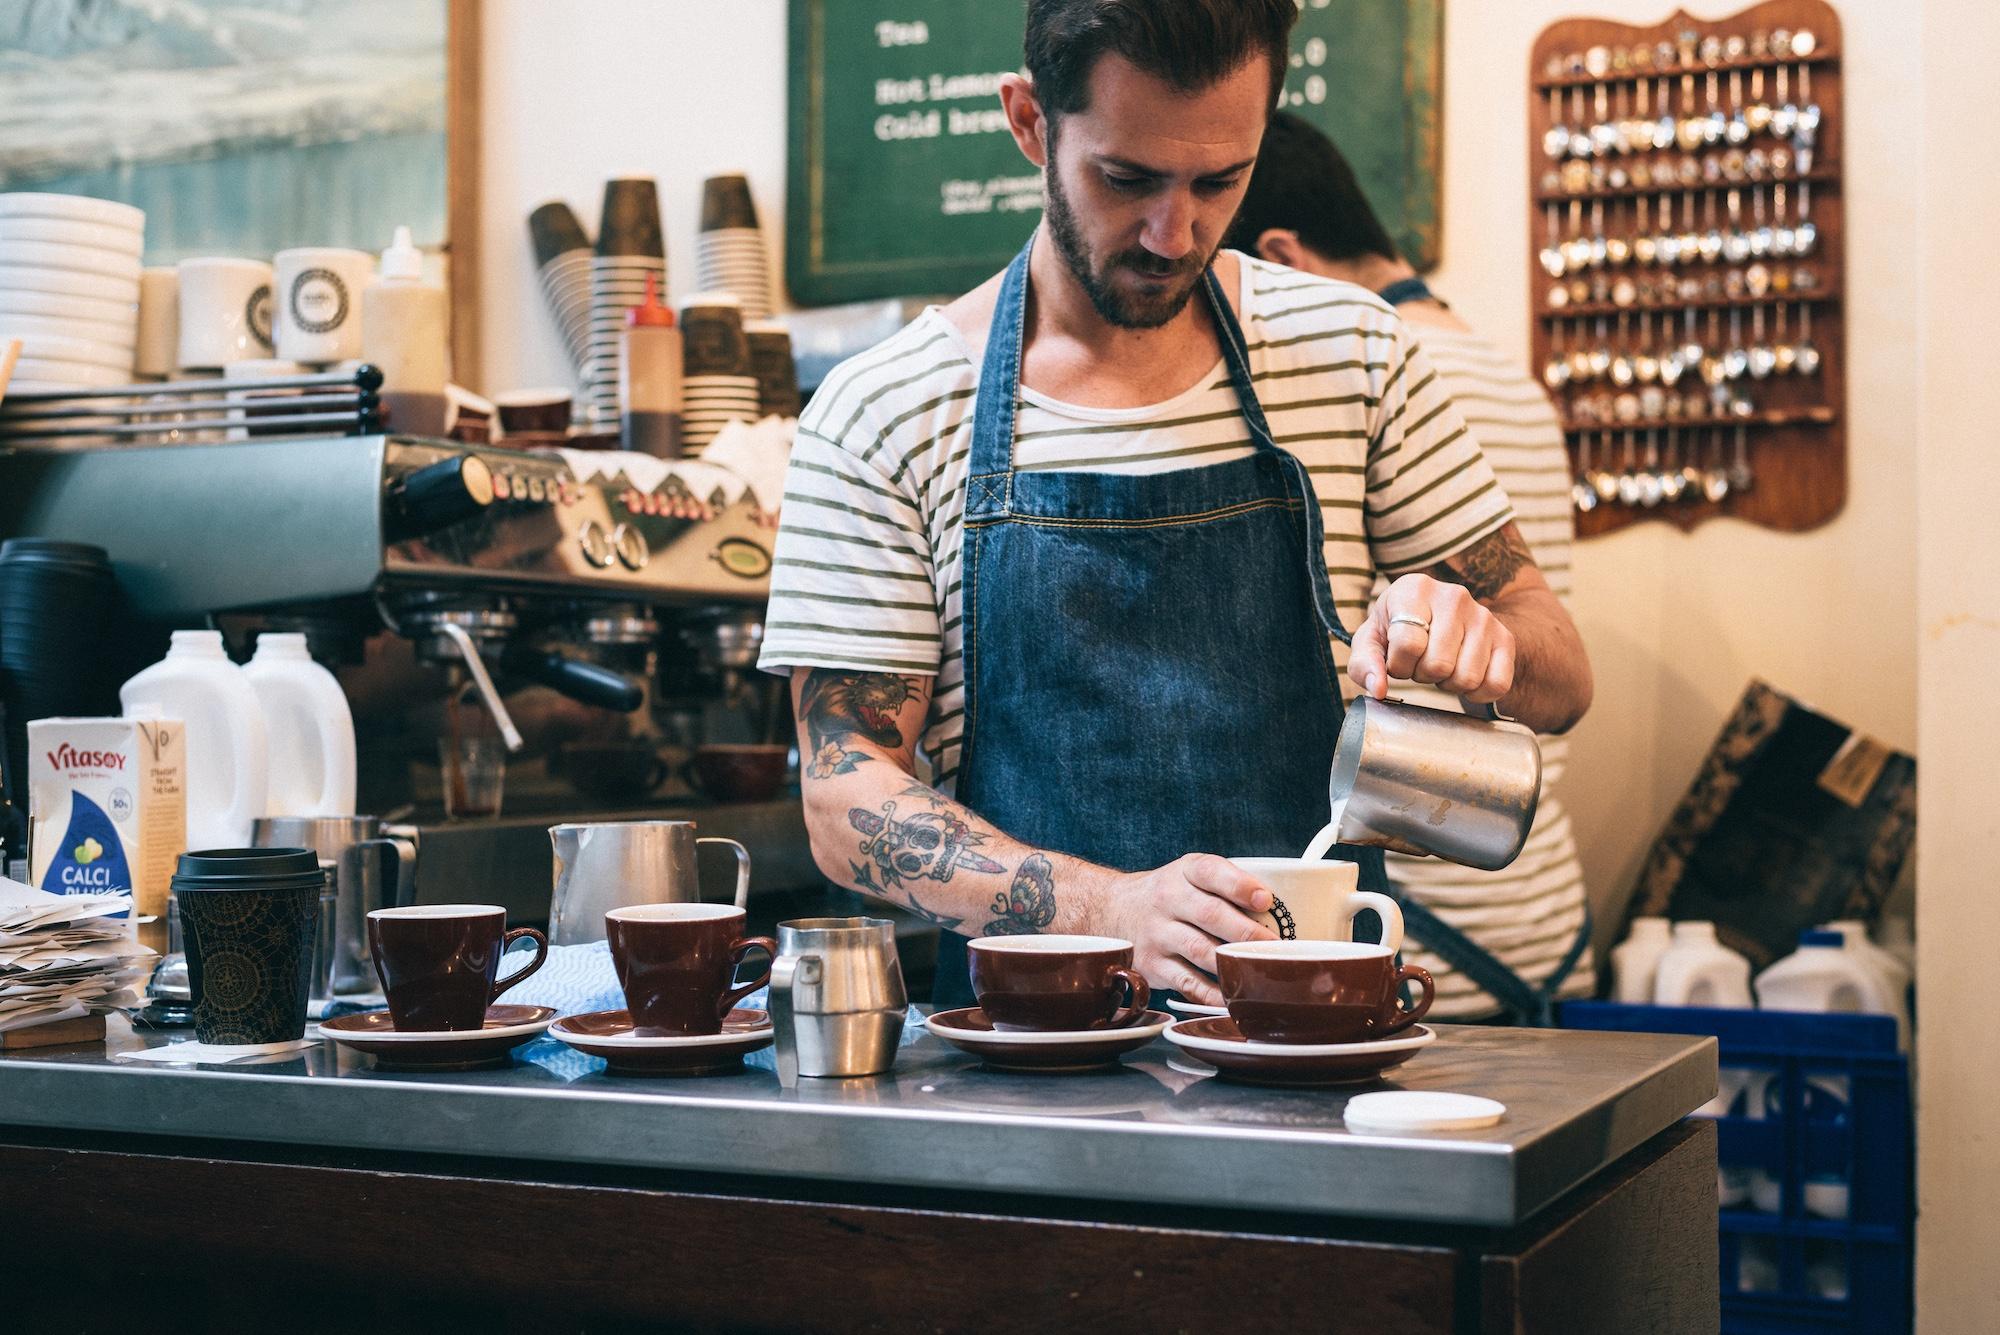 Vudu Cafe & Larder coffee image